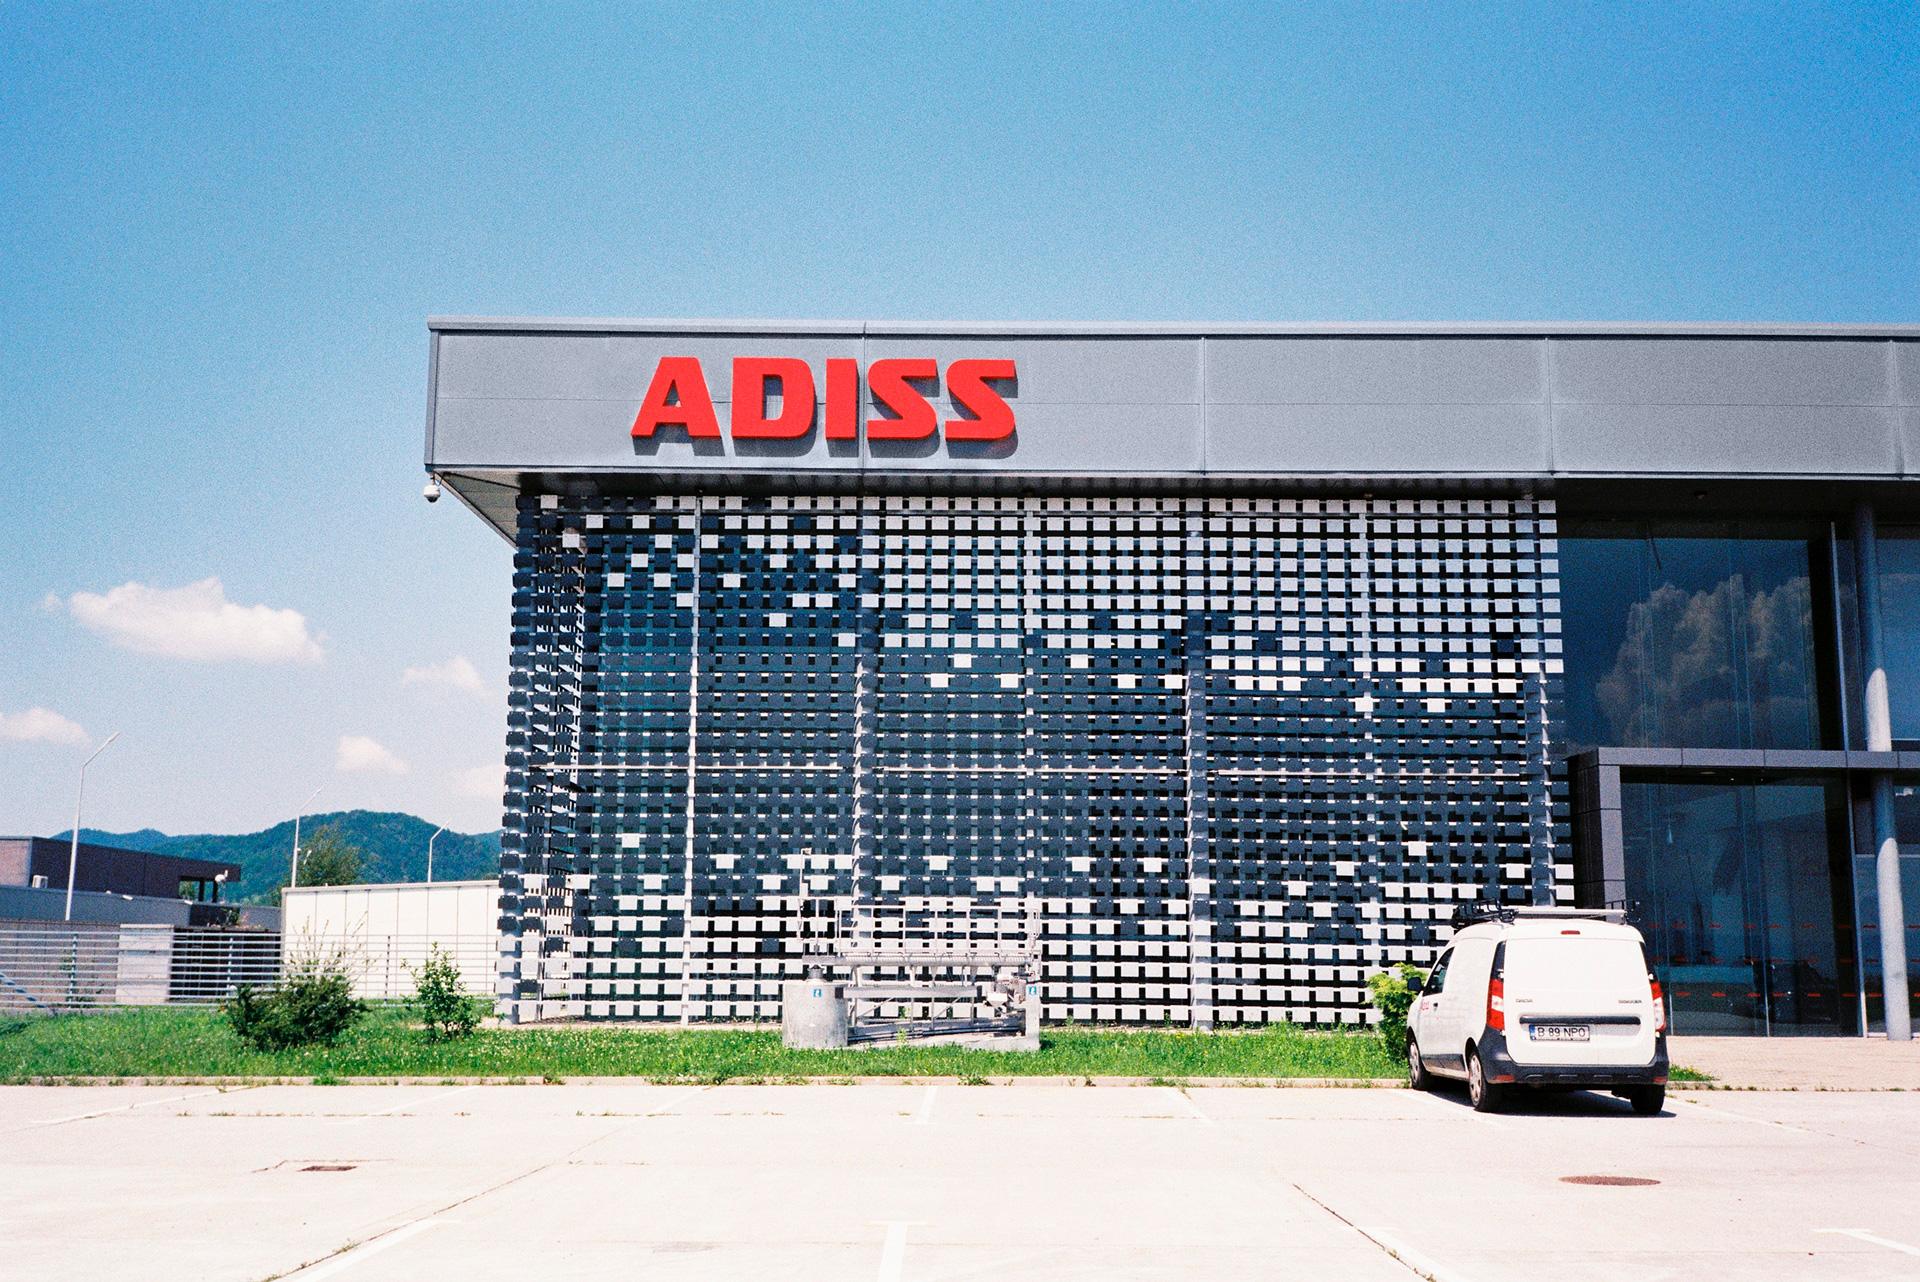 Adiss-hq-01.jpg